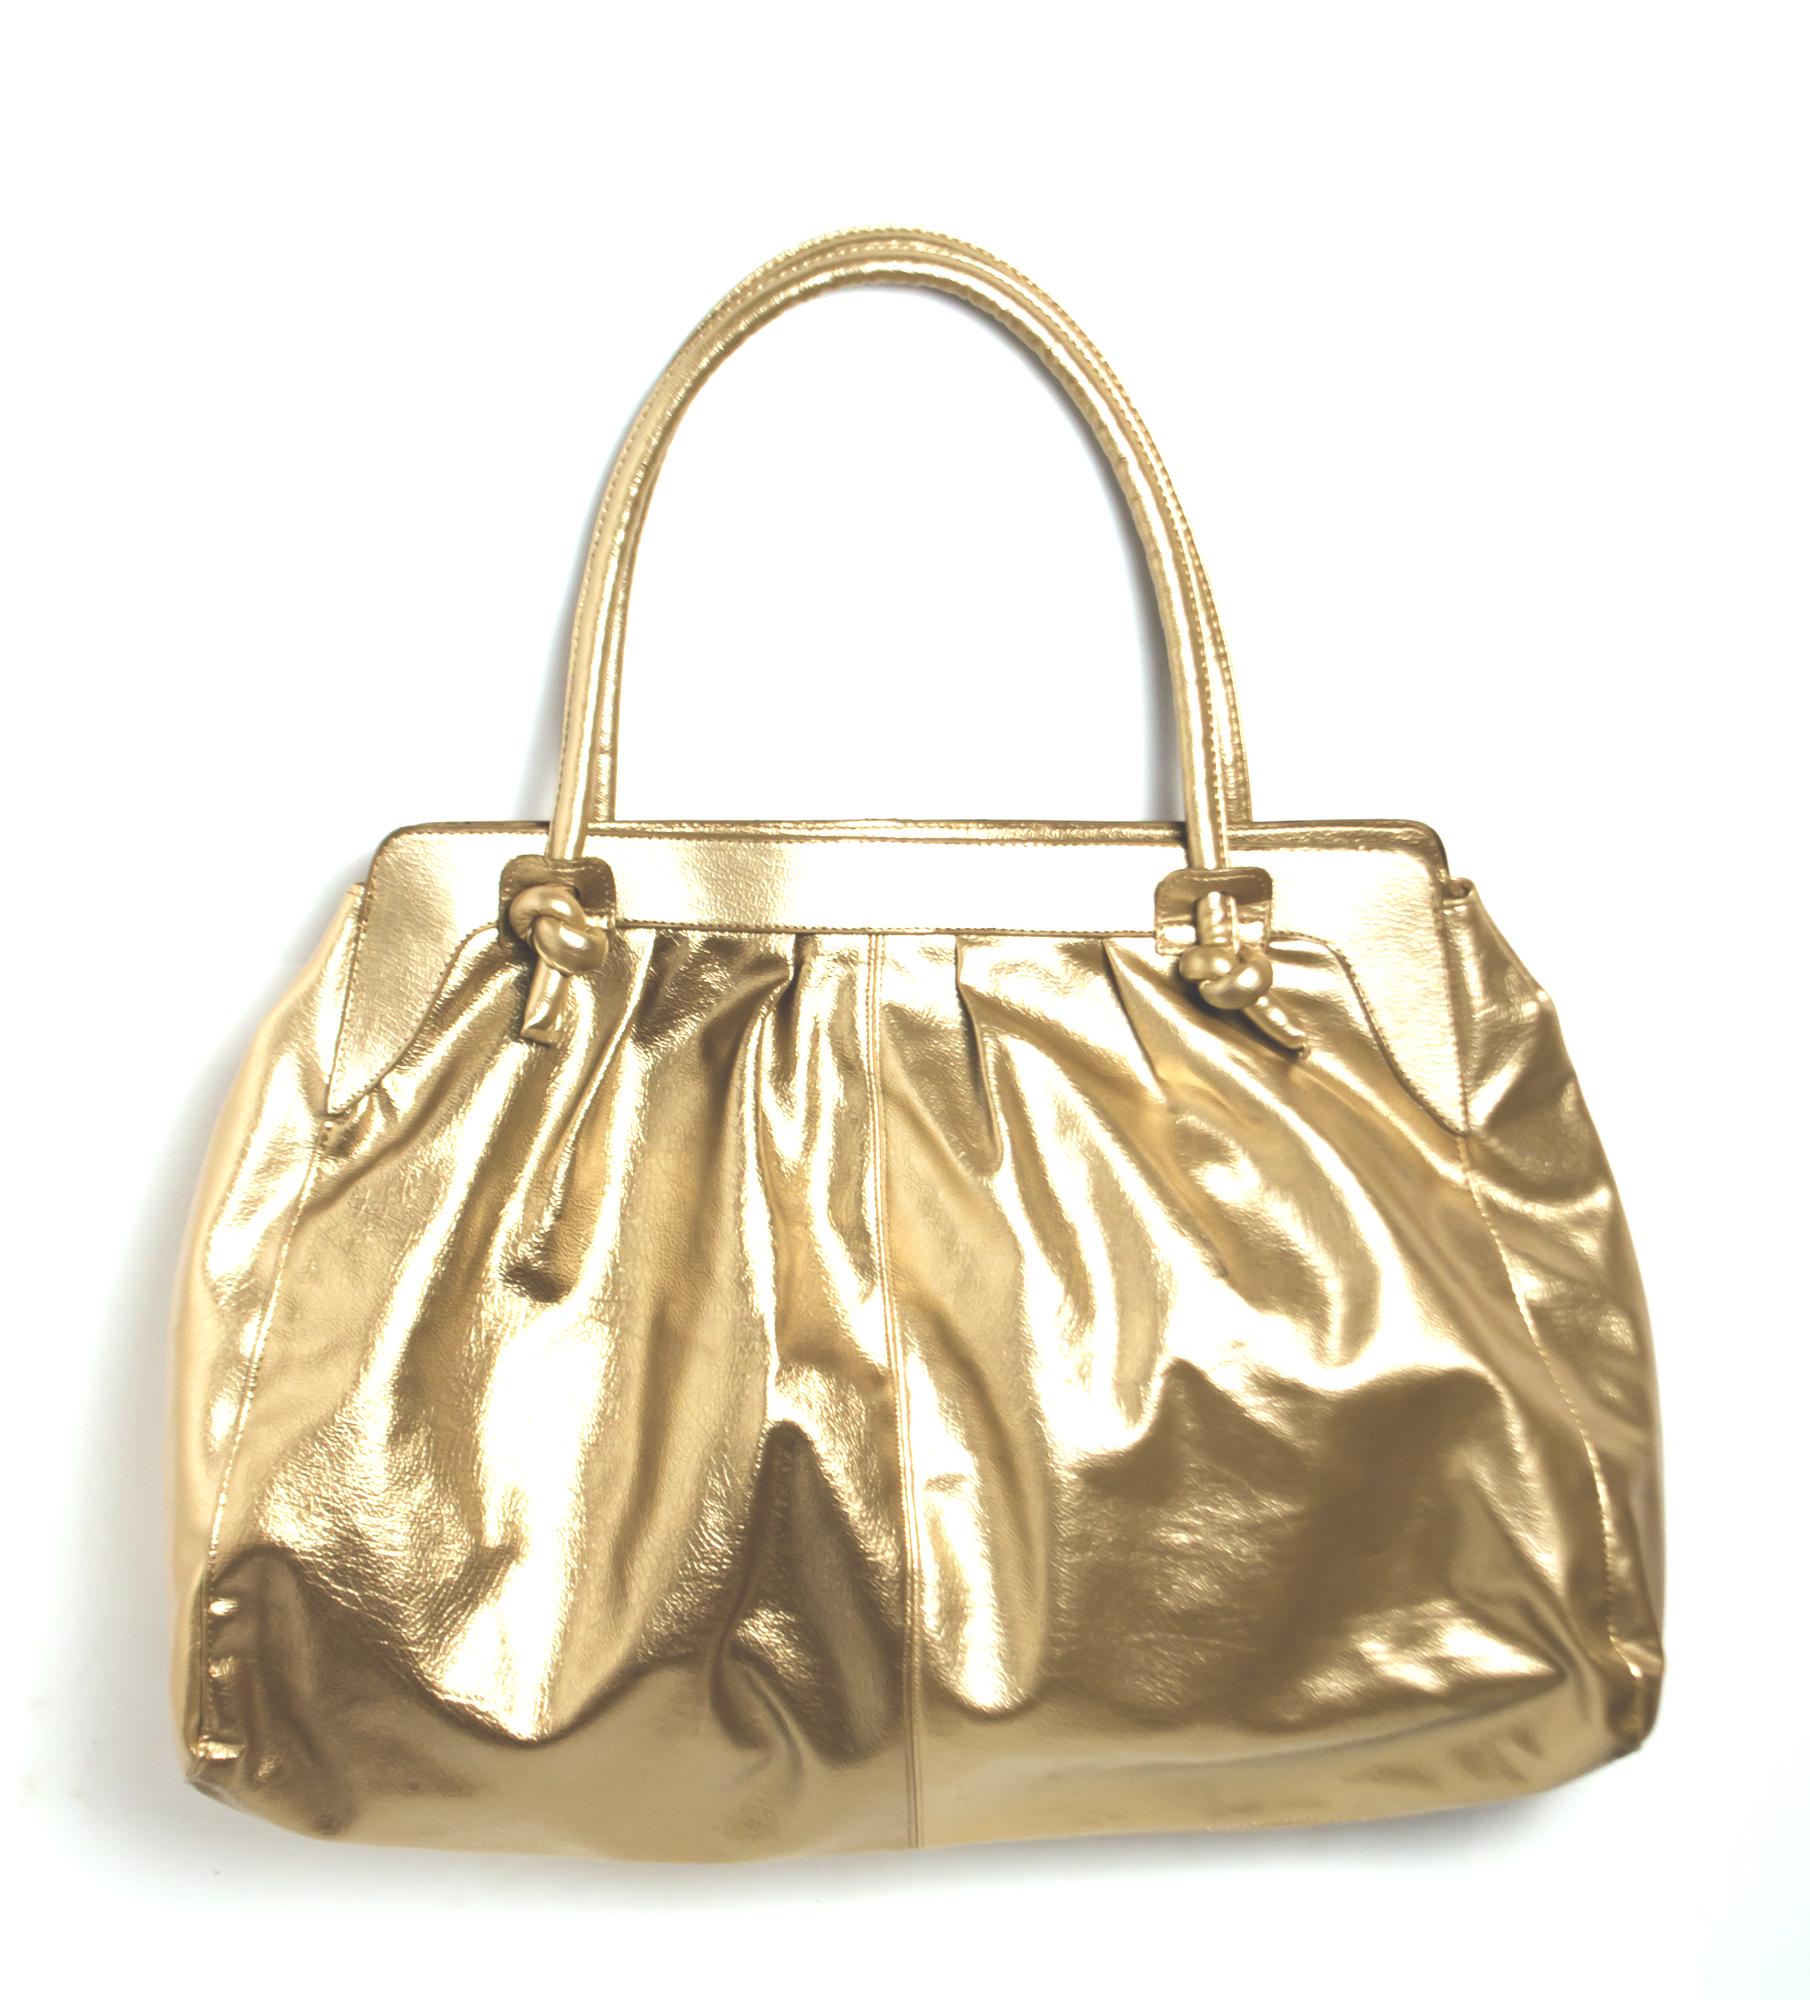 Bolsa Dourada Look : Bolsa dourada grande surreali elo